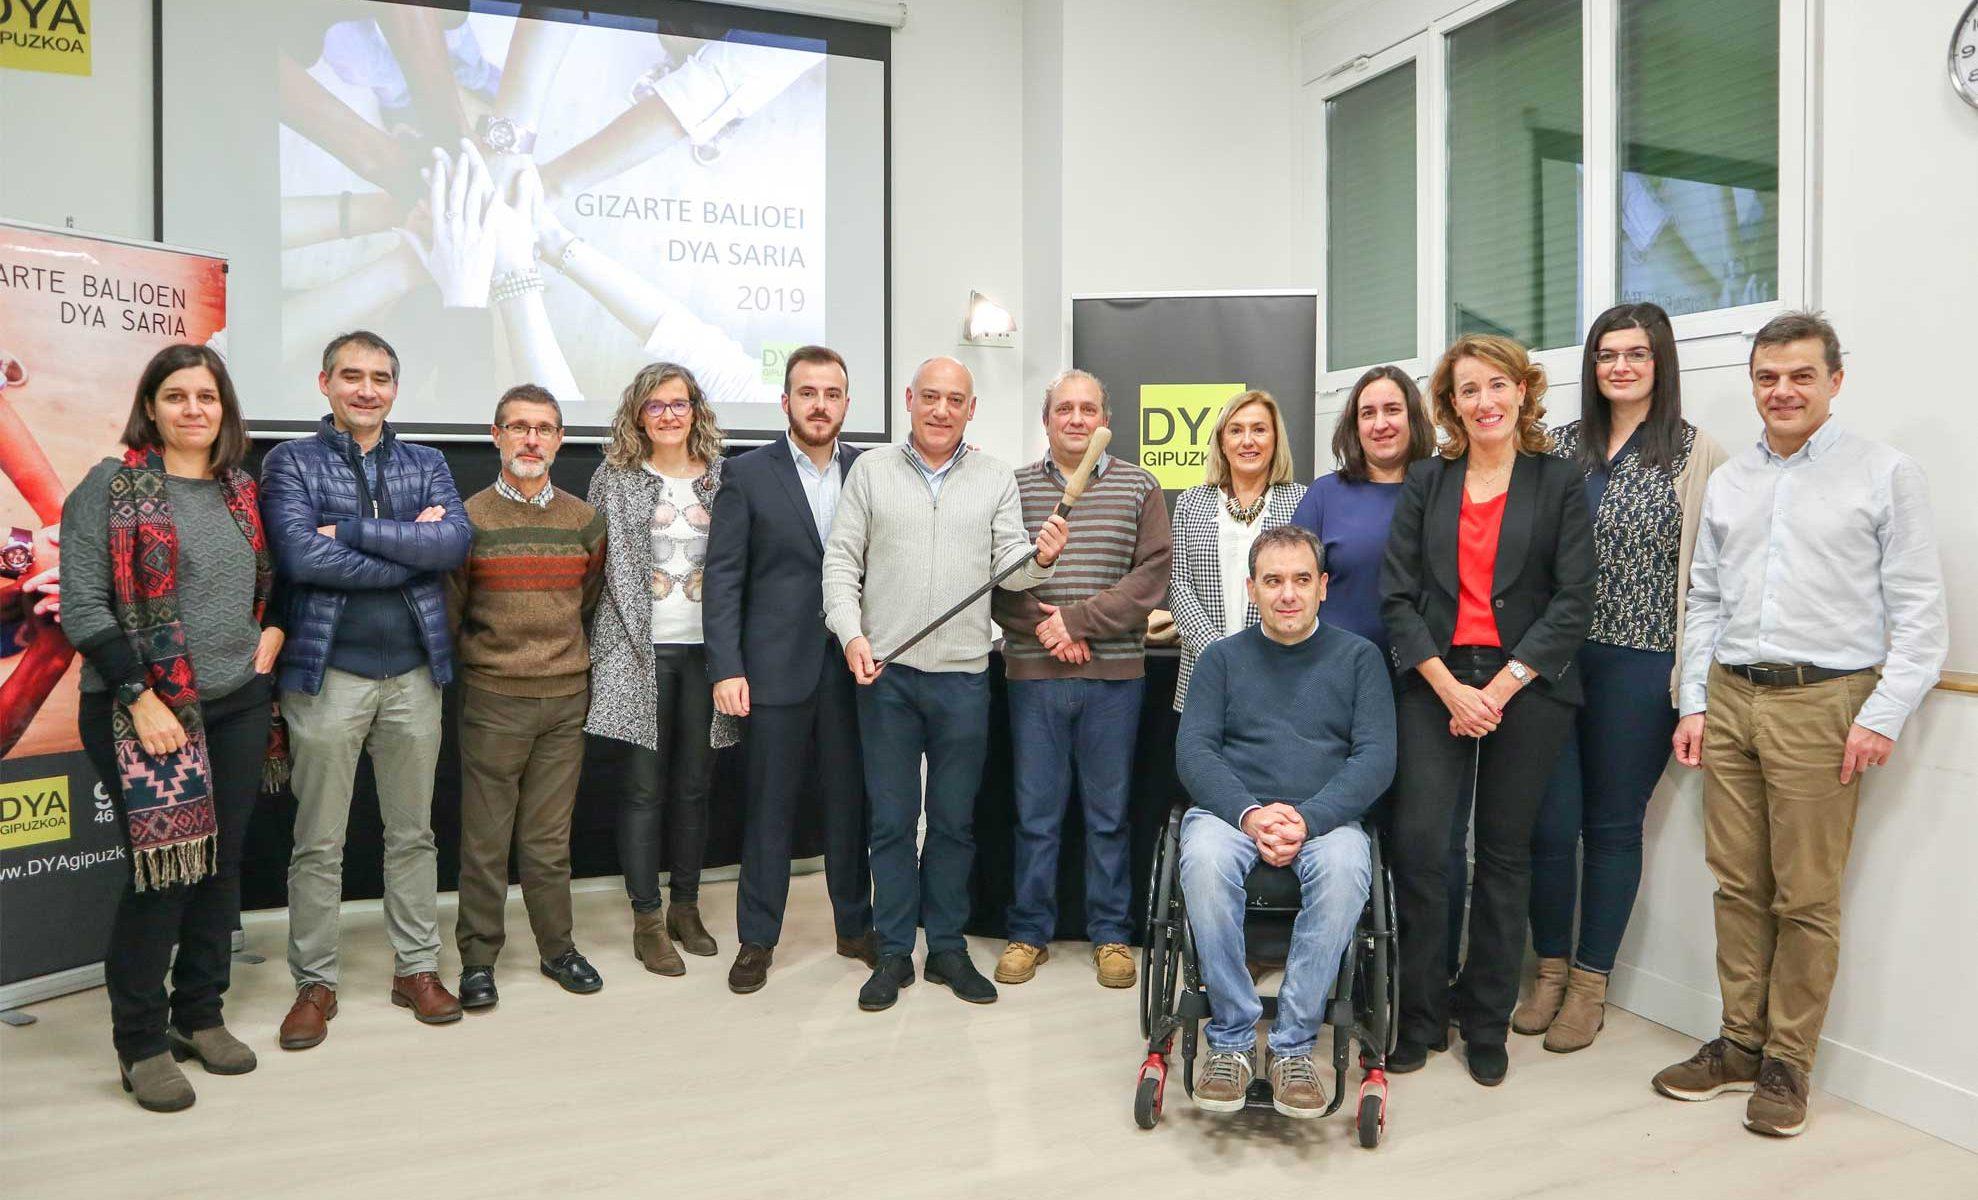 KL katealegaia recibe el premio DYA al valor social 2019